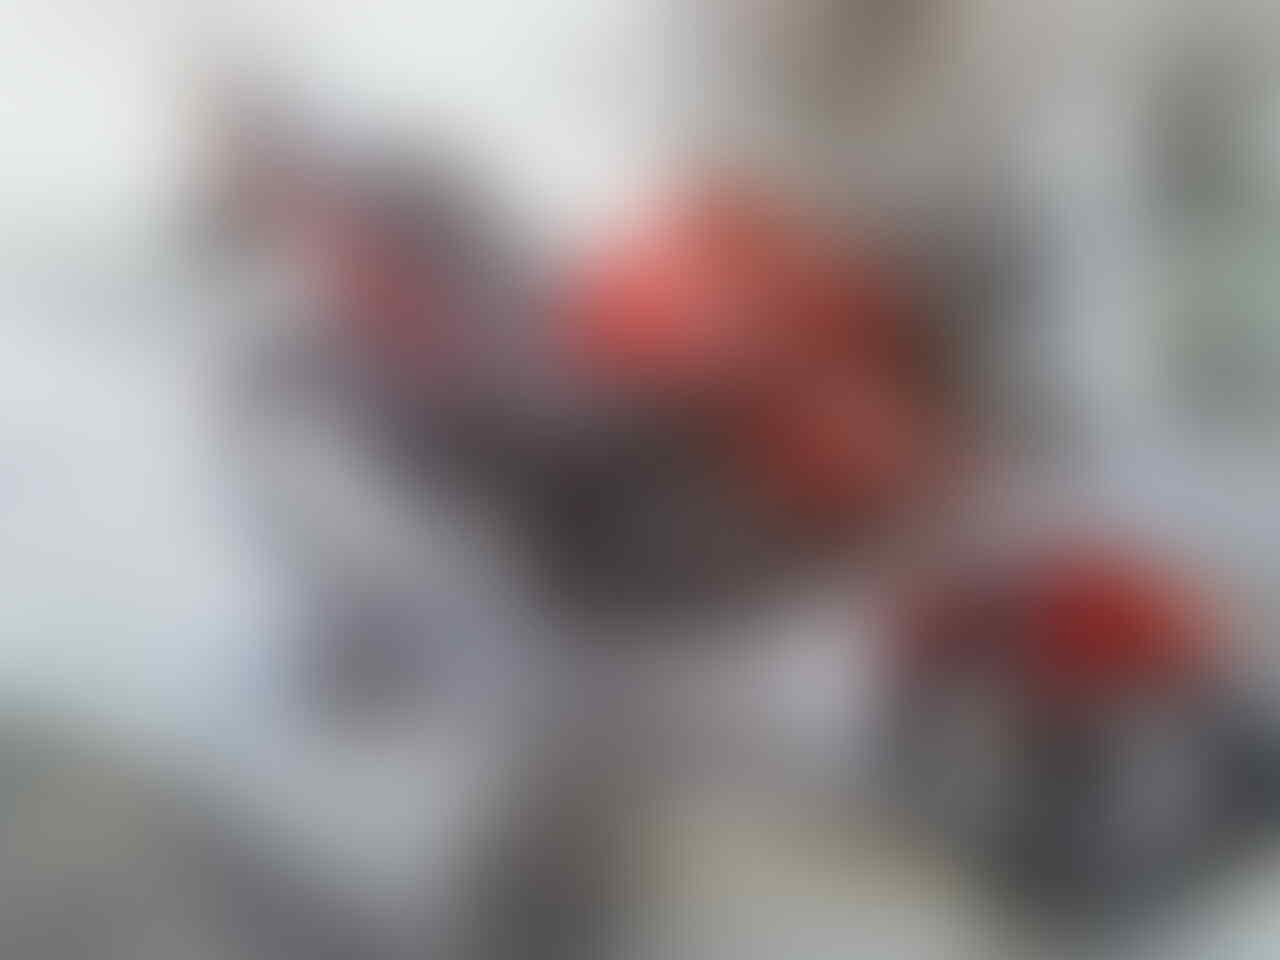 Honda Cb150r Streetfire On Kaskus Page 413 All New Cbr 150r Racing Red Salatiga Hosticus